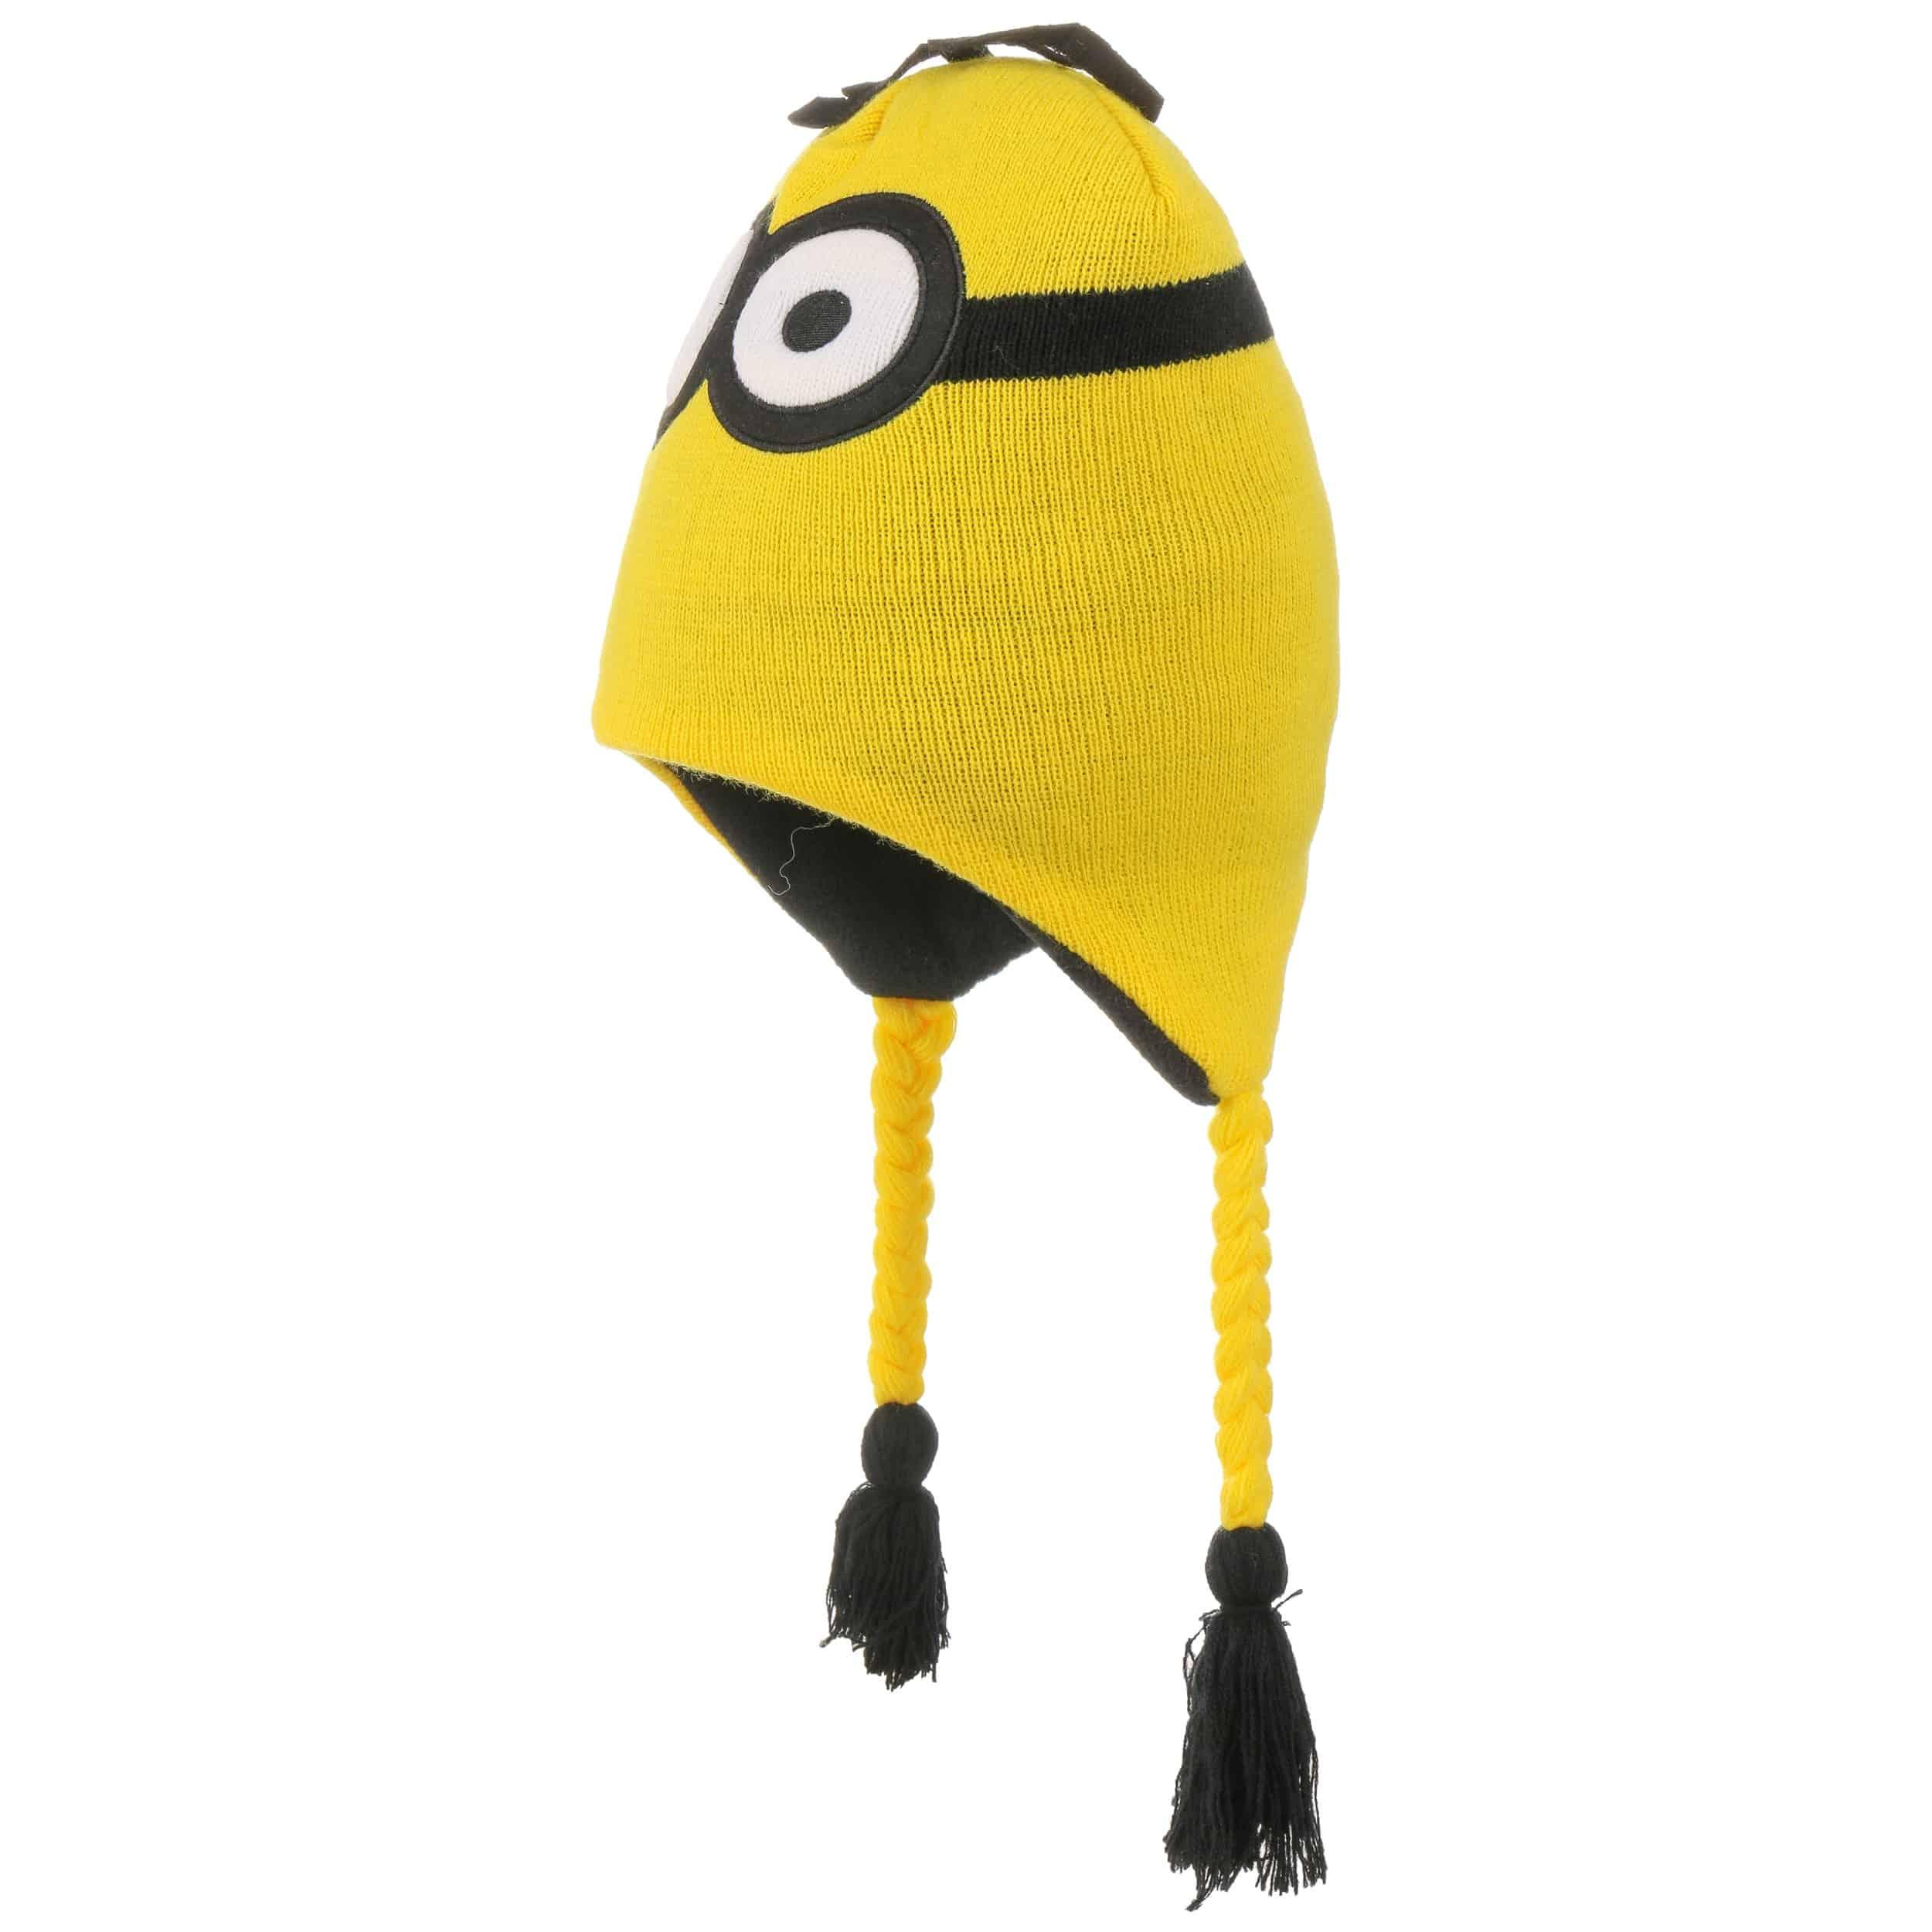 Gorro Peruano Kids Minions - Gorros - sombreroshop.es aeffe2544ba